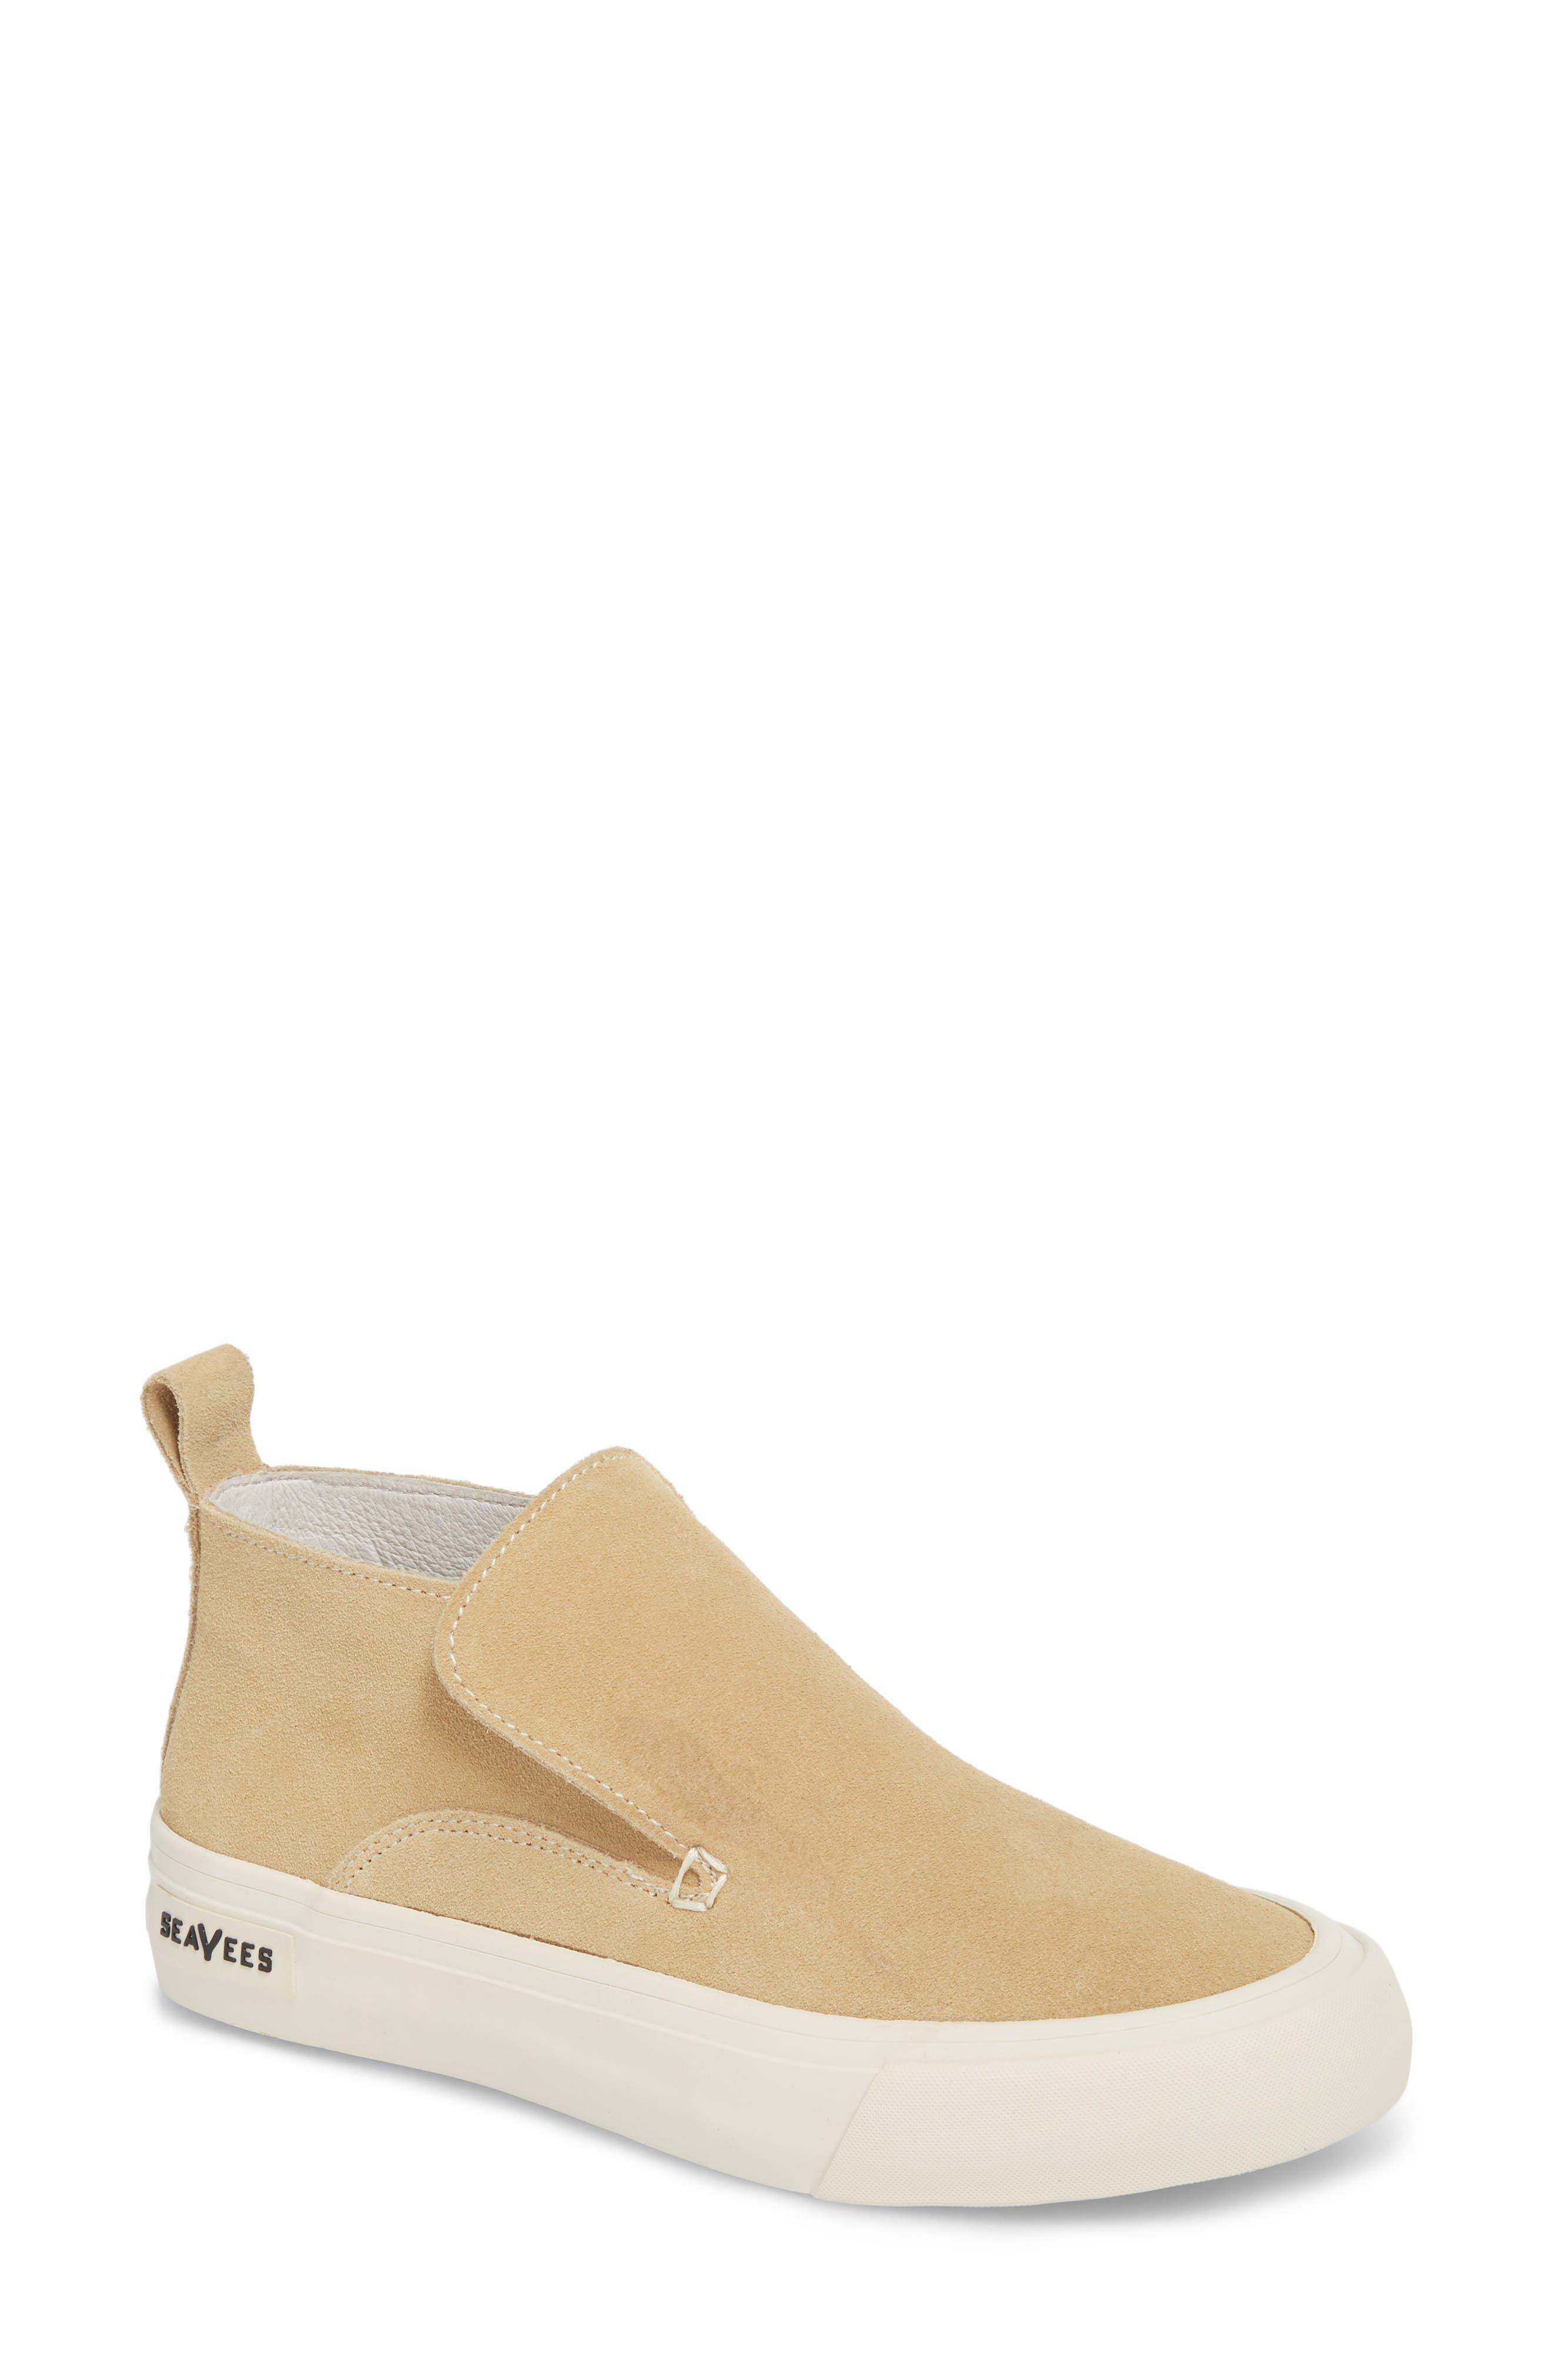 Huntington Middie Slip-On Sneaker,                             Main thumbnail 1, color,                             Dune